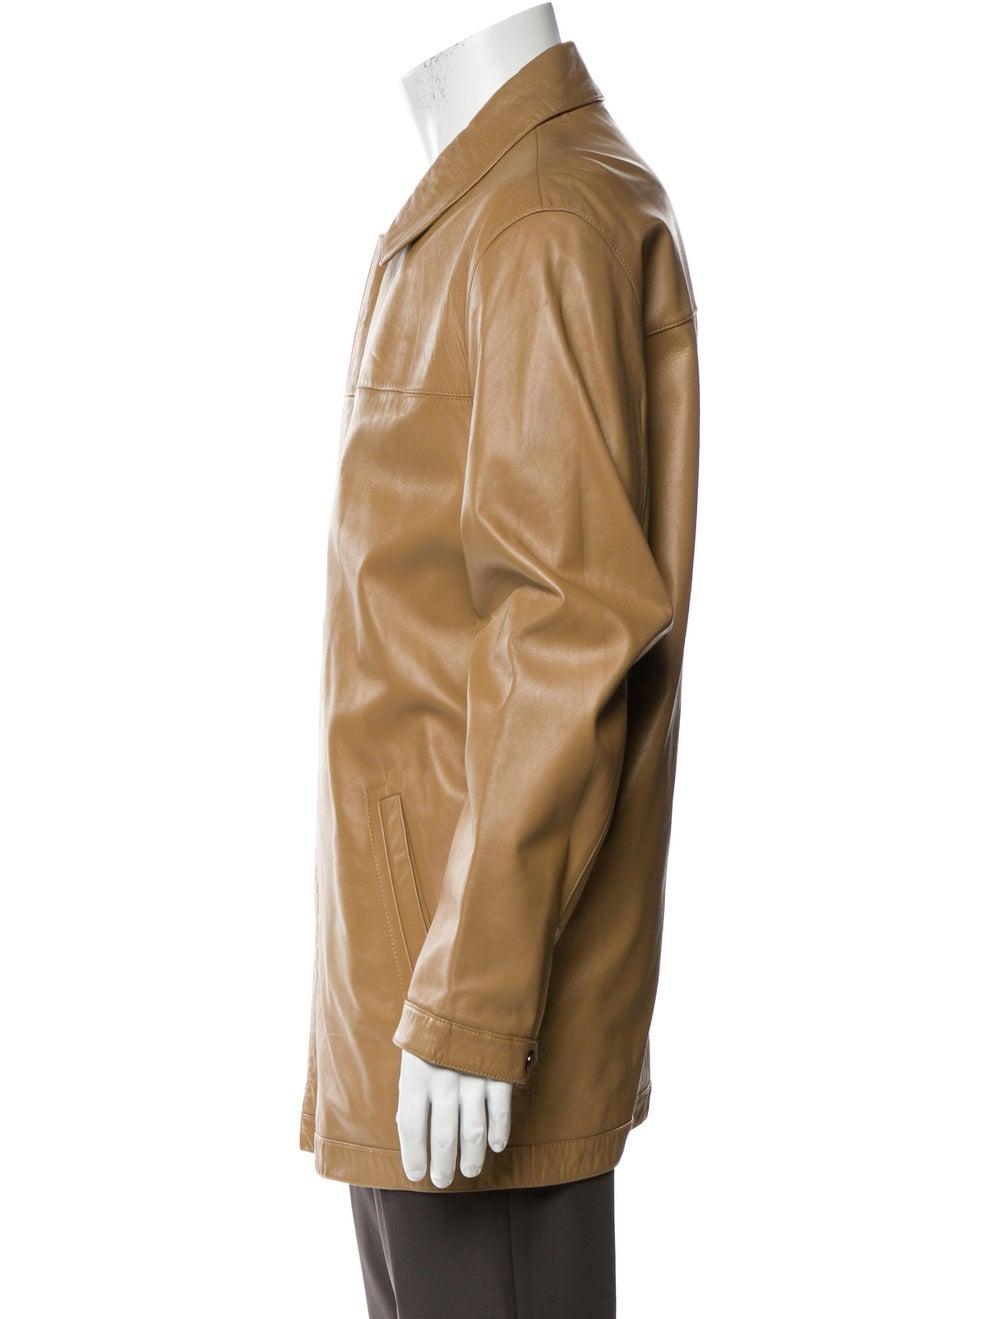 Balenciaga Lamb Leather Jacket - image 2